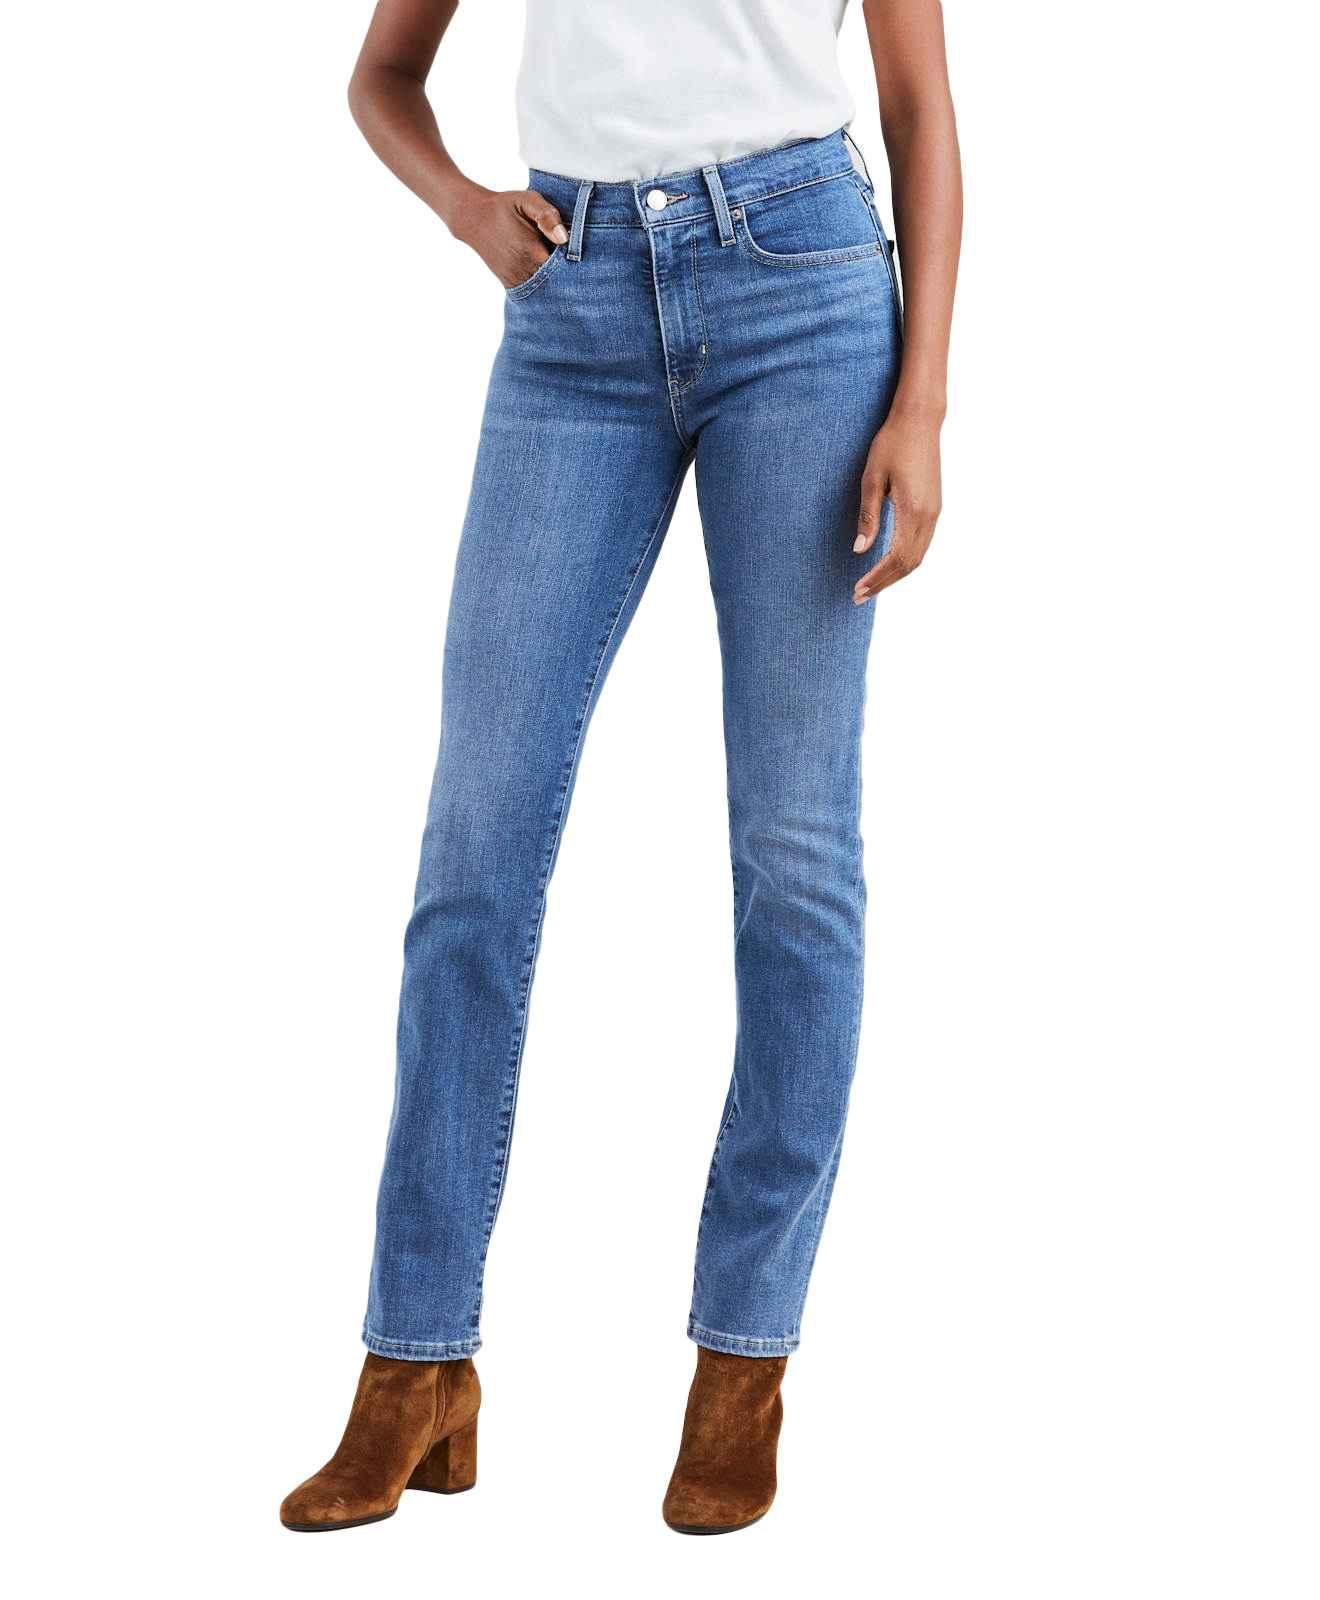 Levis 724 Jeans.jpg